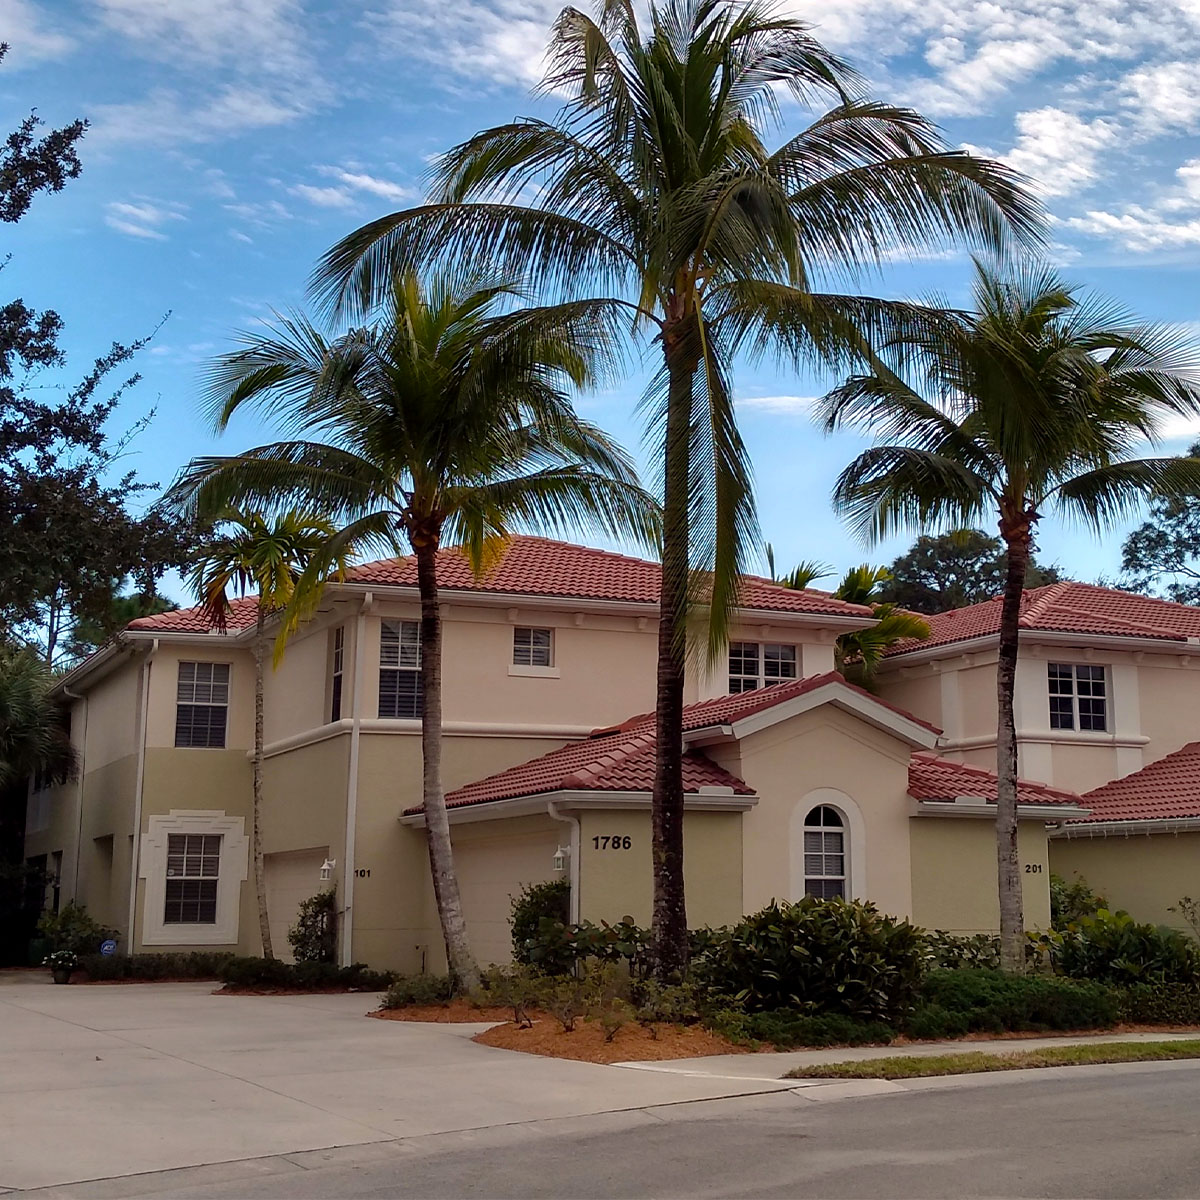 Bimini Bay I | Tarpon Bay Community Association, Inc. - Naples, Florida